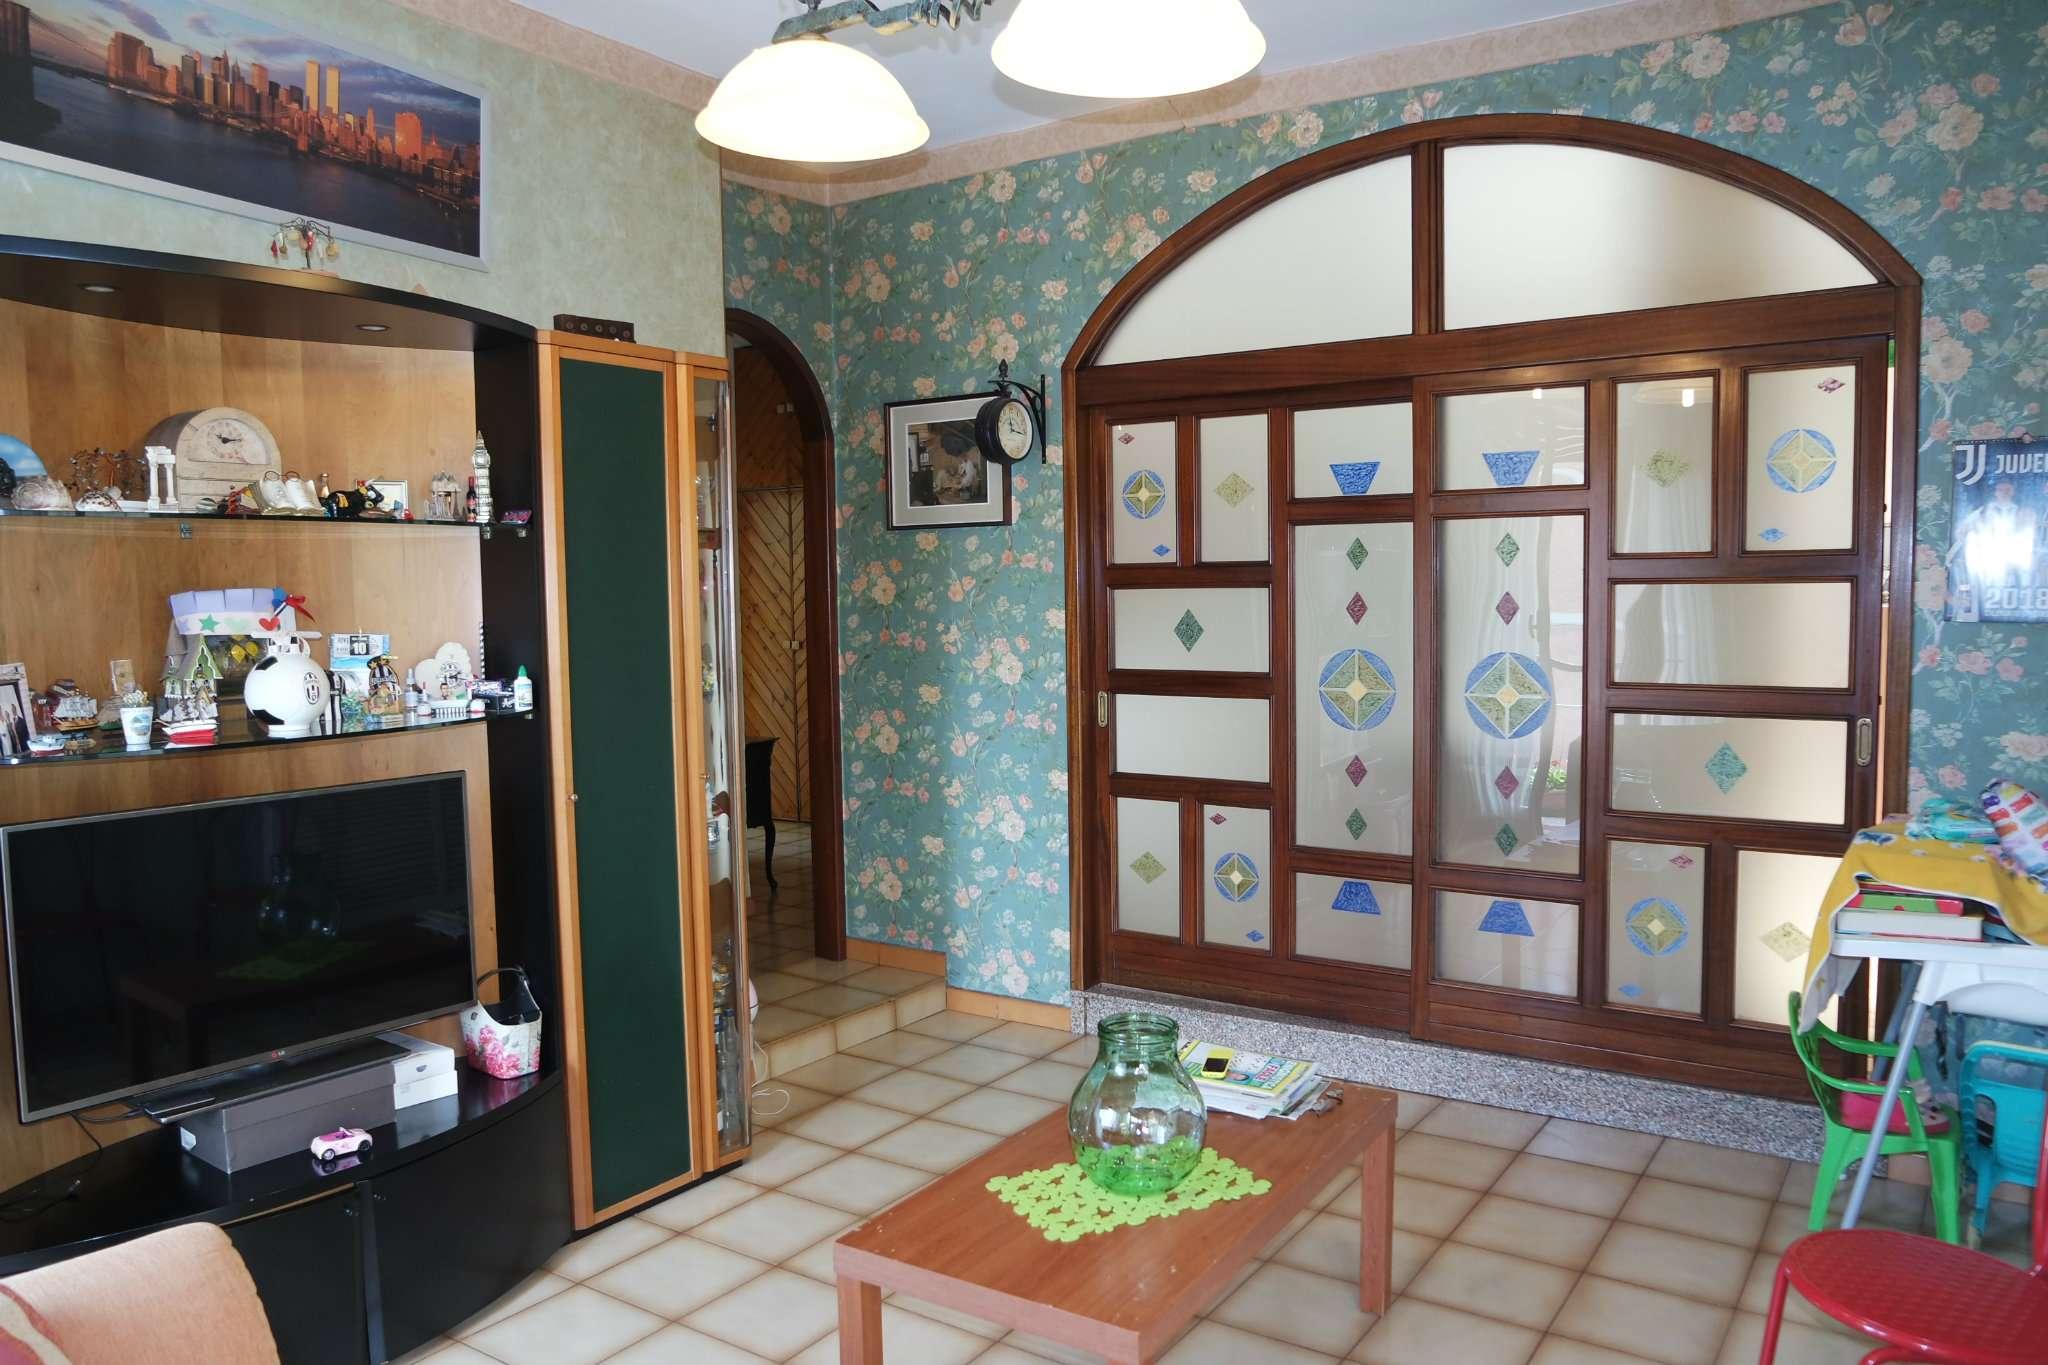 Foto 1 di Appartamento via Gorizia, Torino (zona Santa Rita)